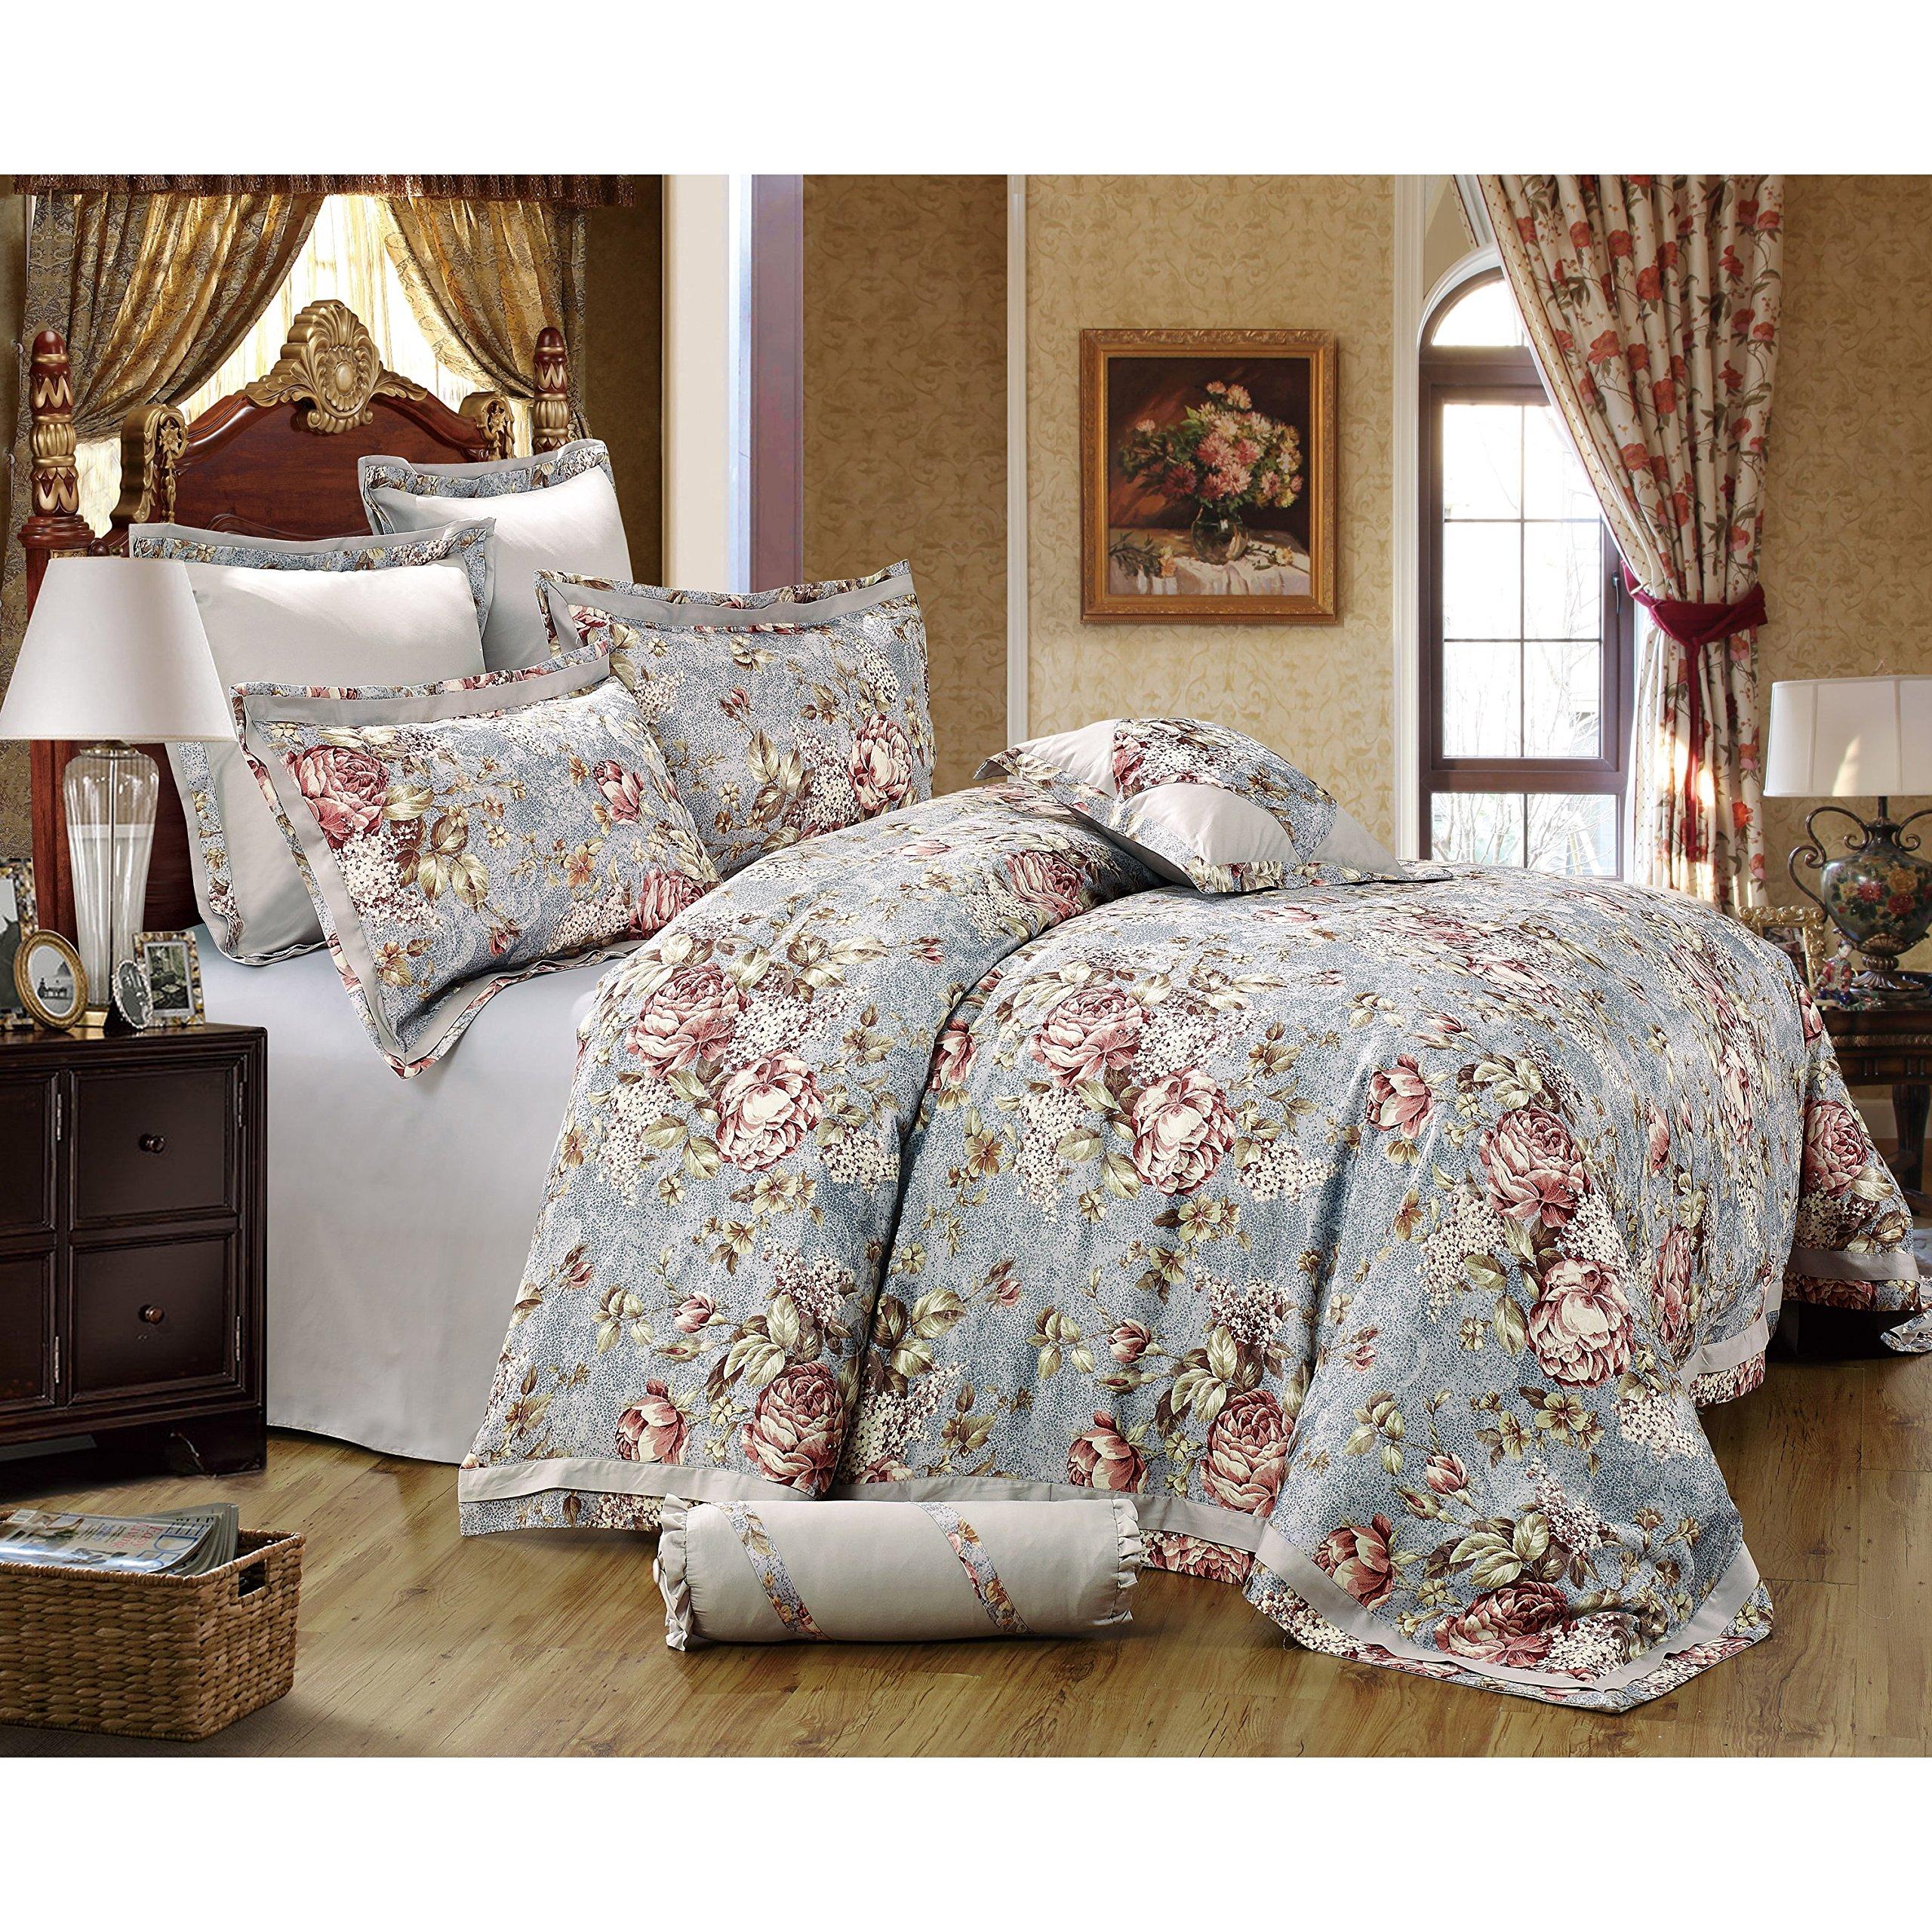 Sherry Kline Gwyneth 8-piece Sateen Luxury Comforter Set Spa Blue Oversized